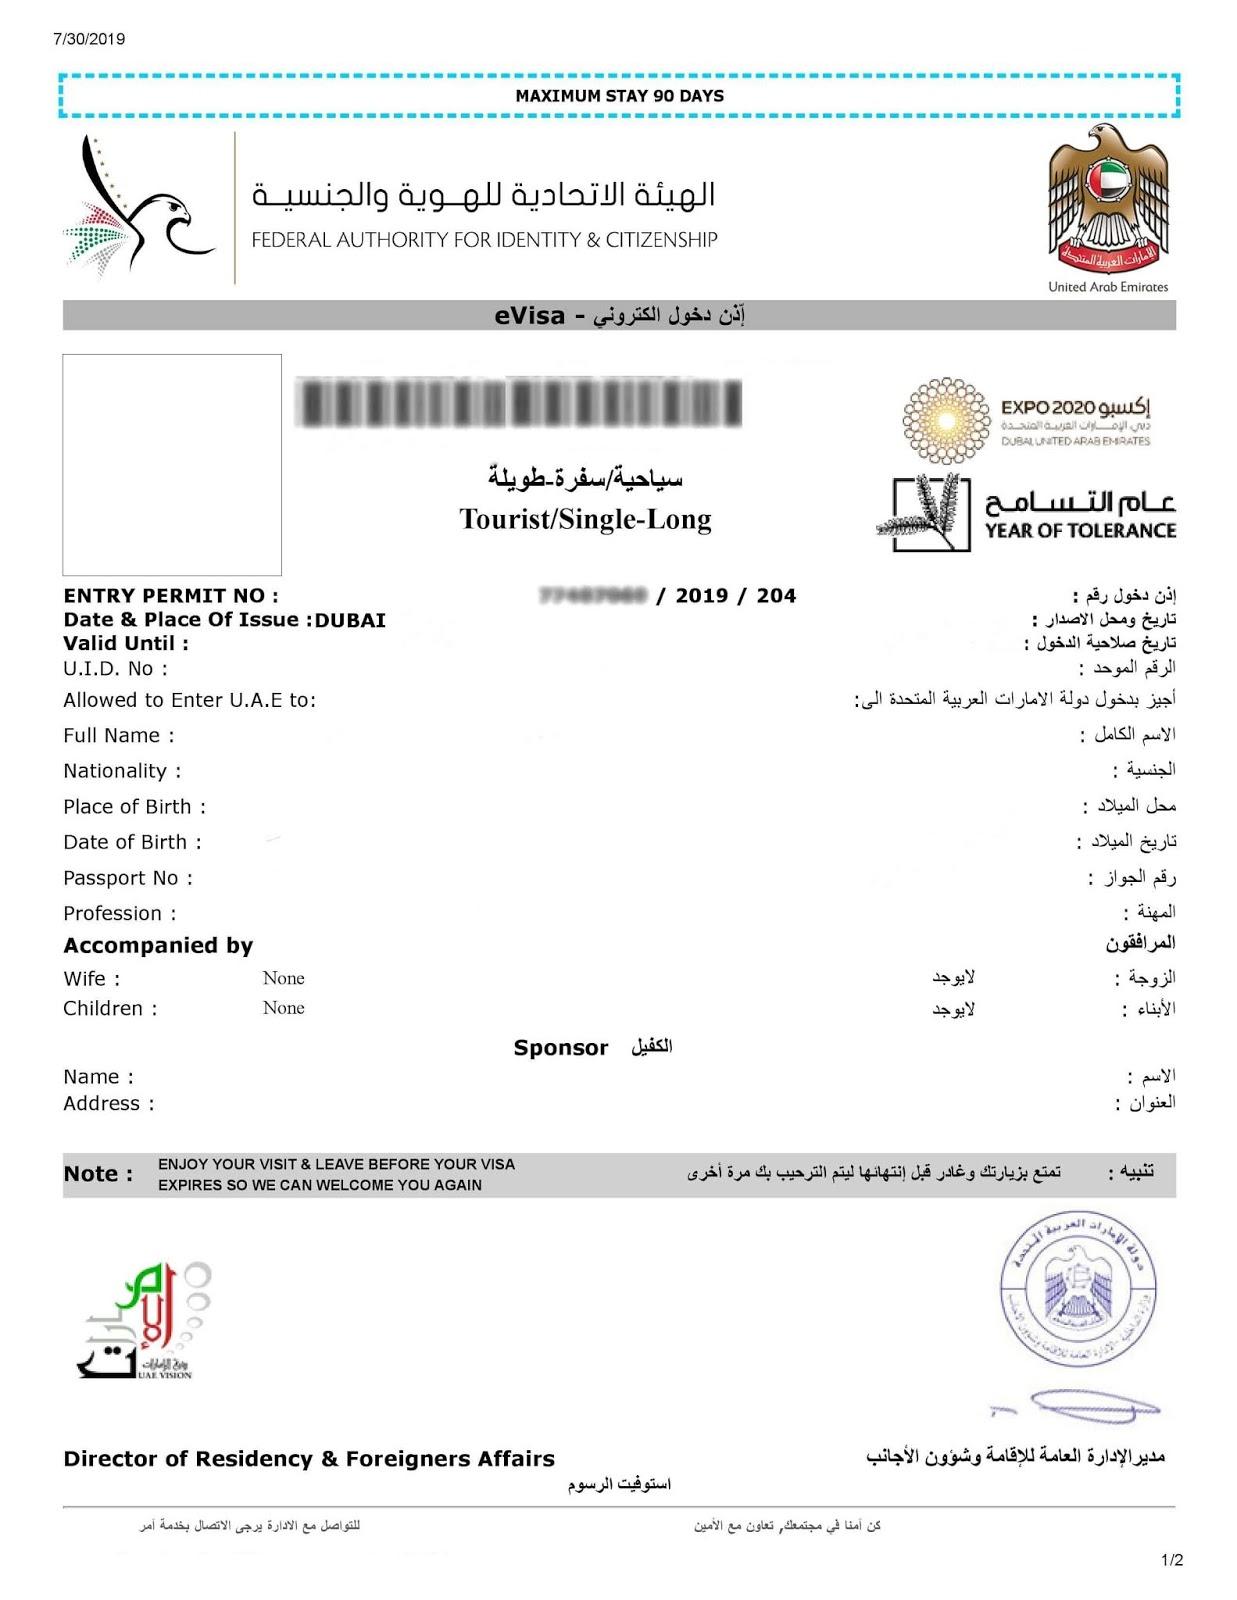 Get UAE Visit Visa -Tourist Visa without Security Deposit - UAE Labours